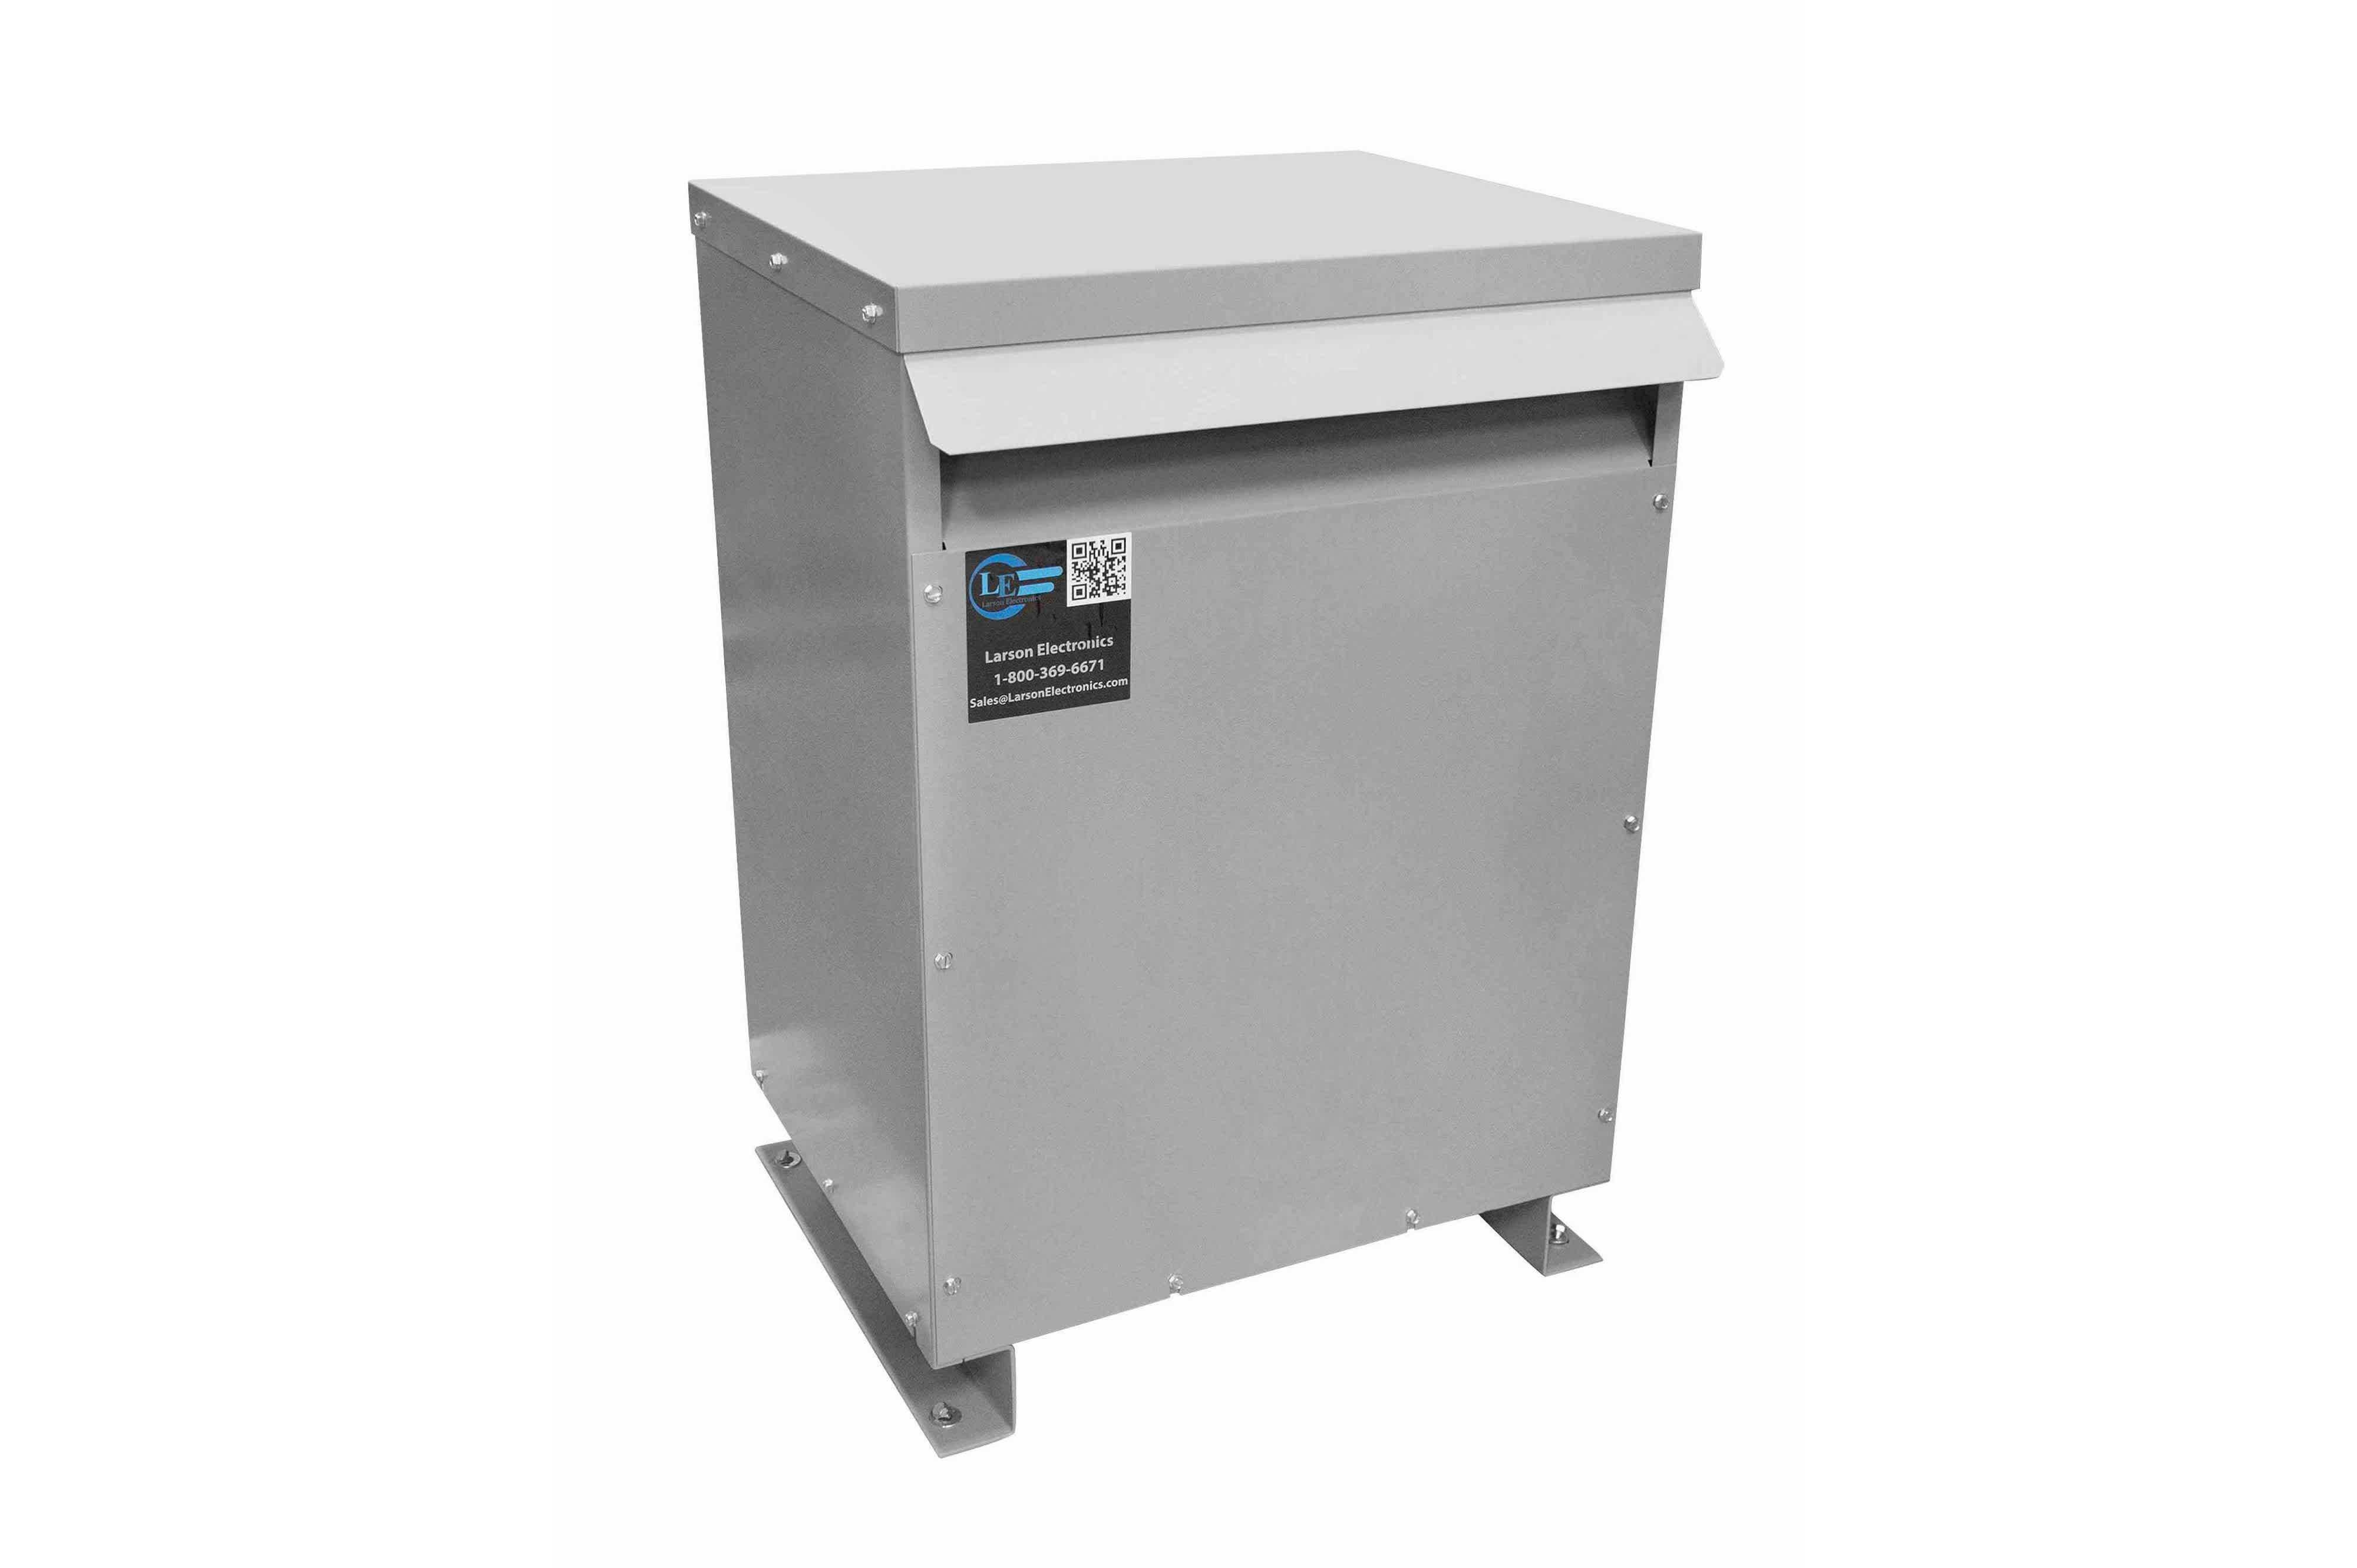 300 kVA 3PH Isolation Transformer, 600V Wye Primary, 240V/120 Delta Secondary, N3R, Ventilated, 60 Hz